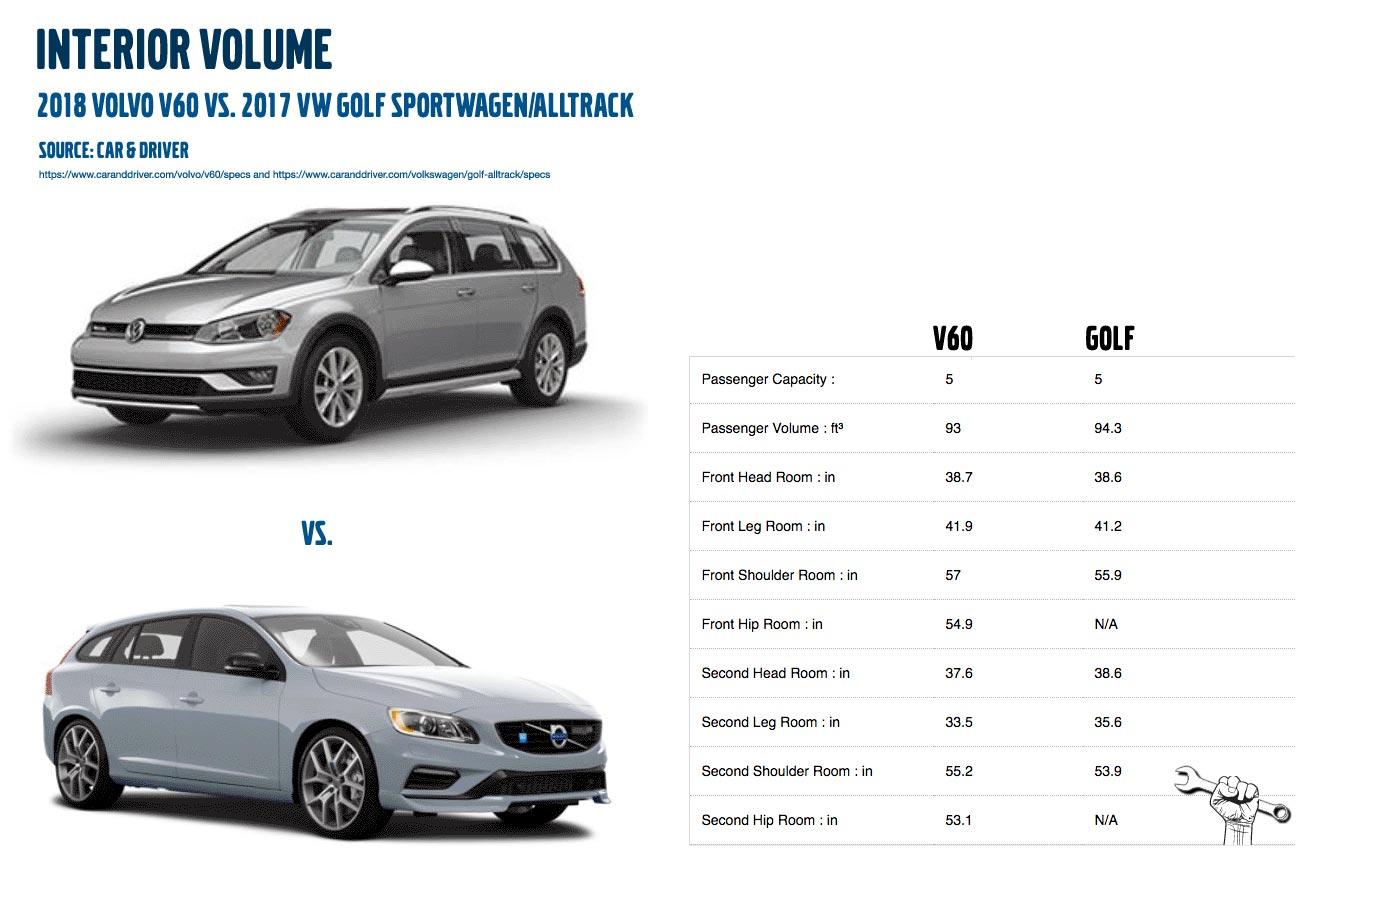 V60 vs. Golf Alltrack interior volume